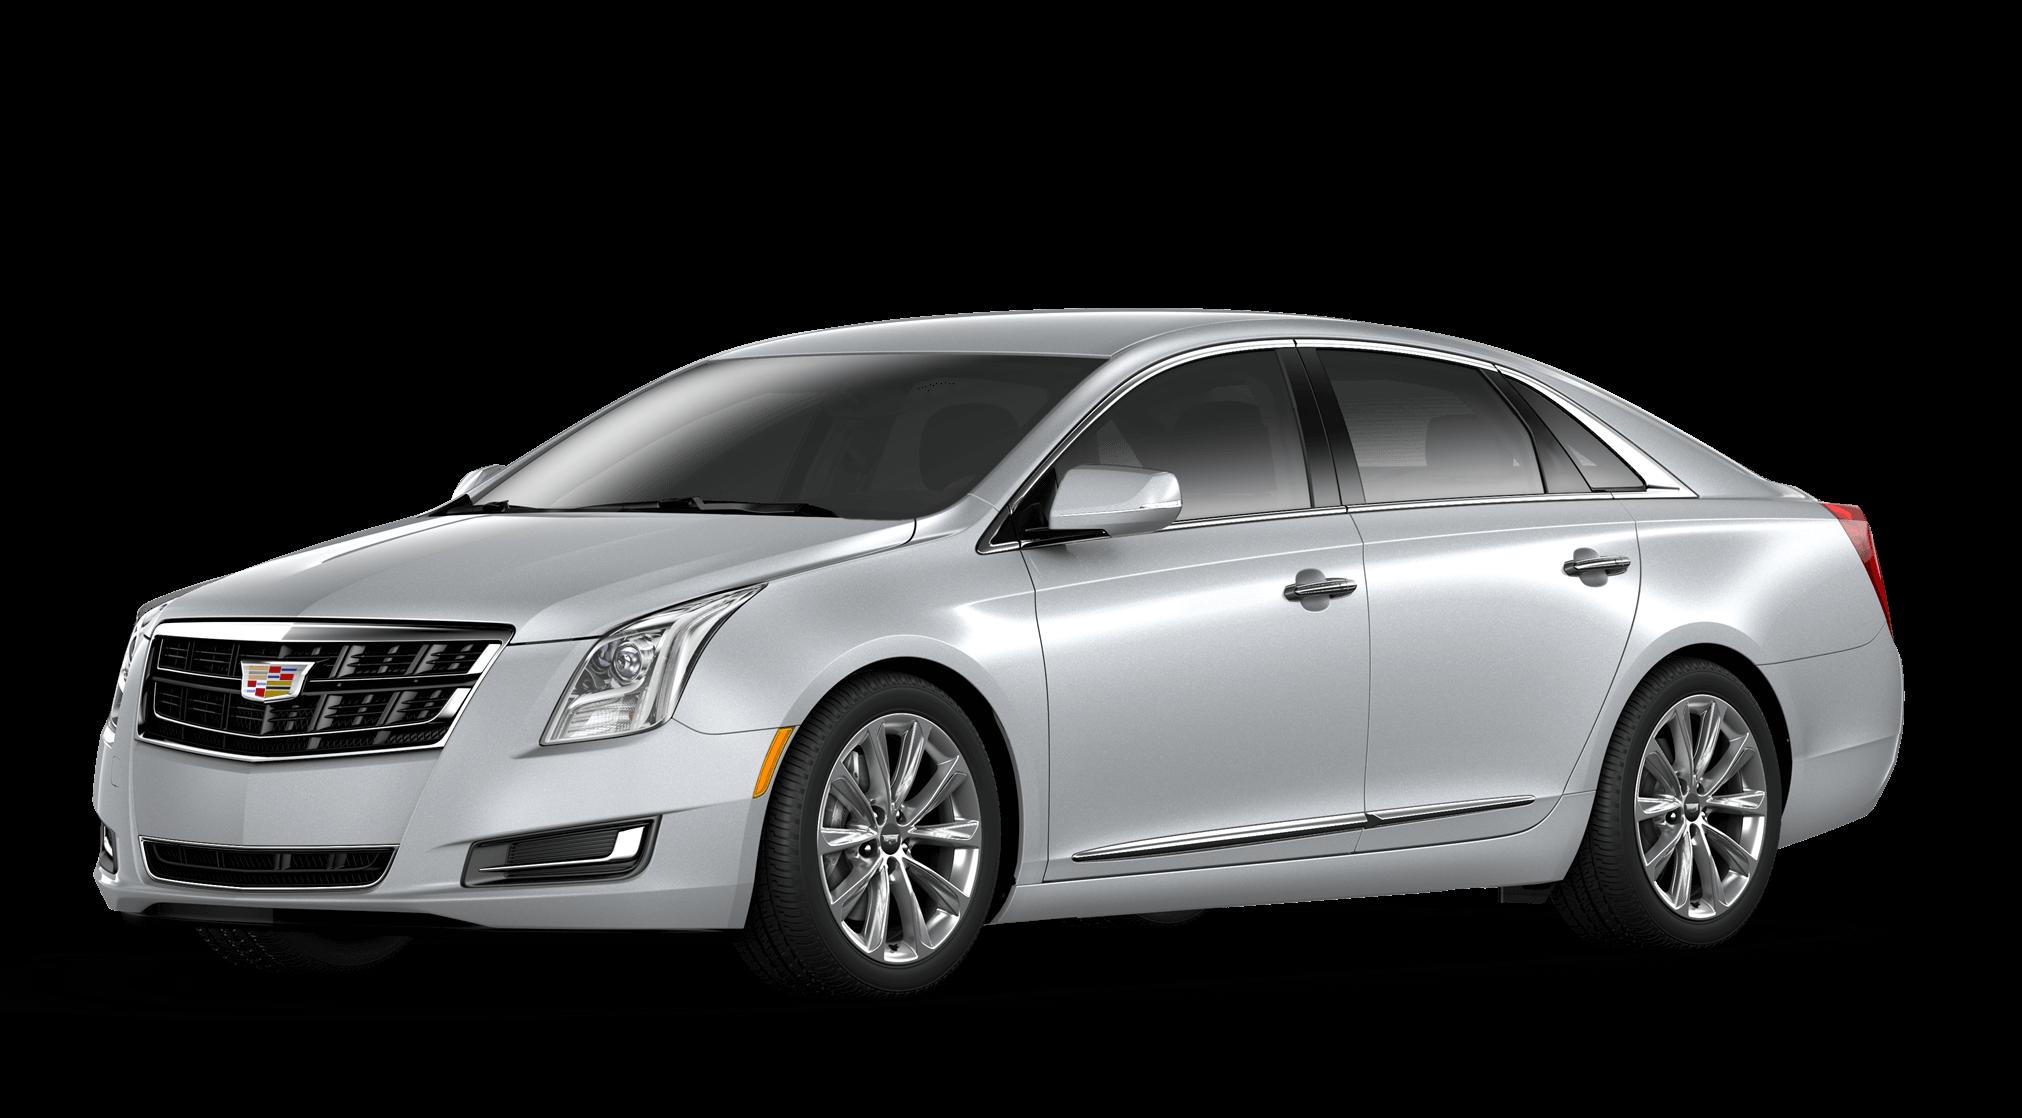 2016 Cadillac XTS Radiant Silver Metallic